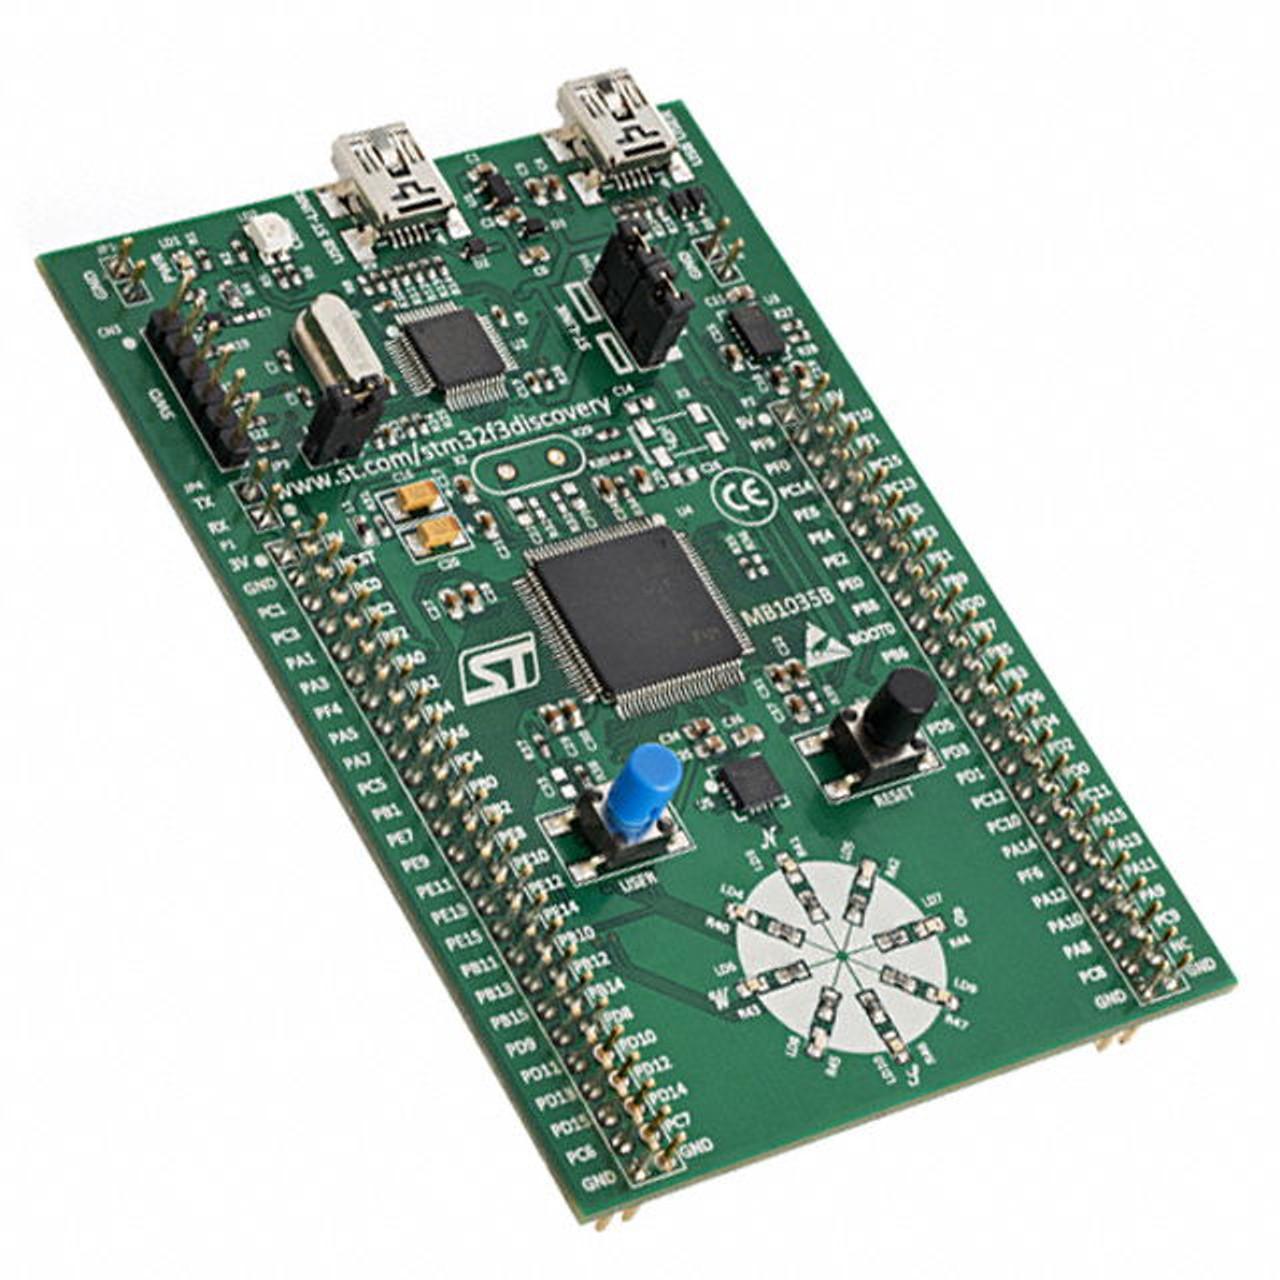 STM32F413H-DISCO - STM32F4 Discovery Kit